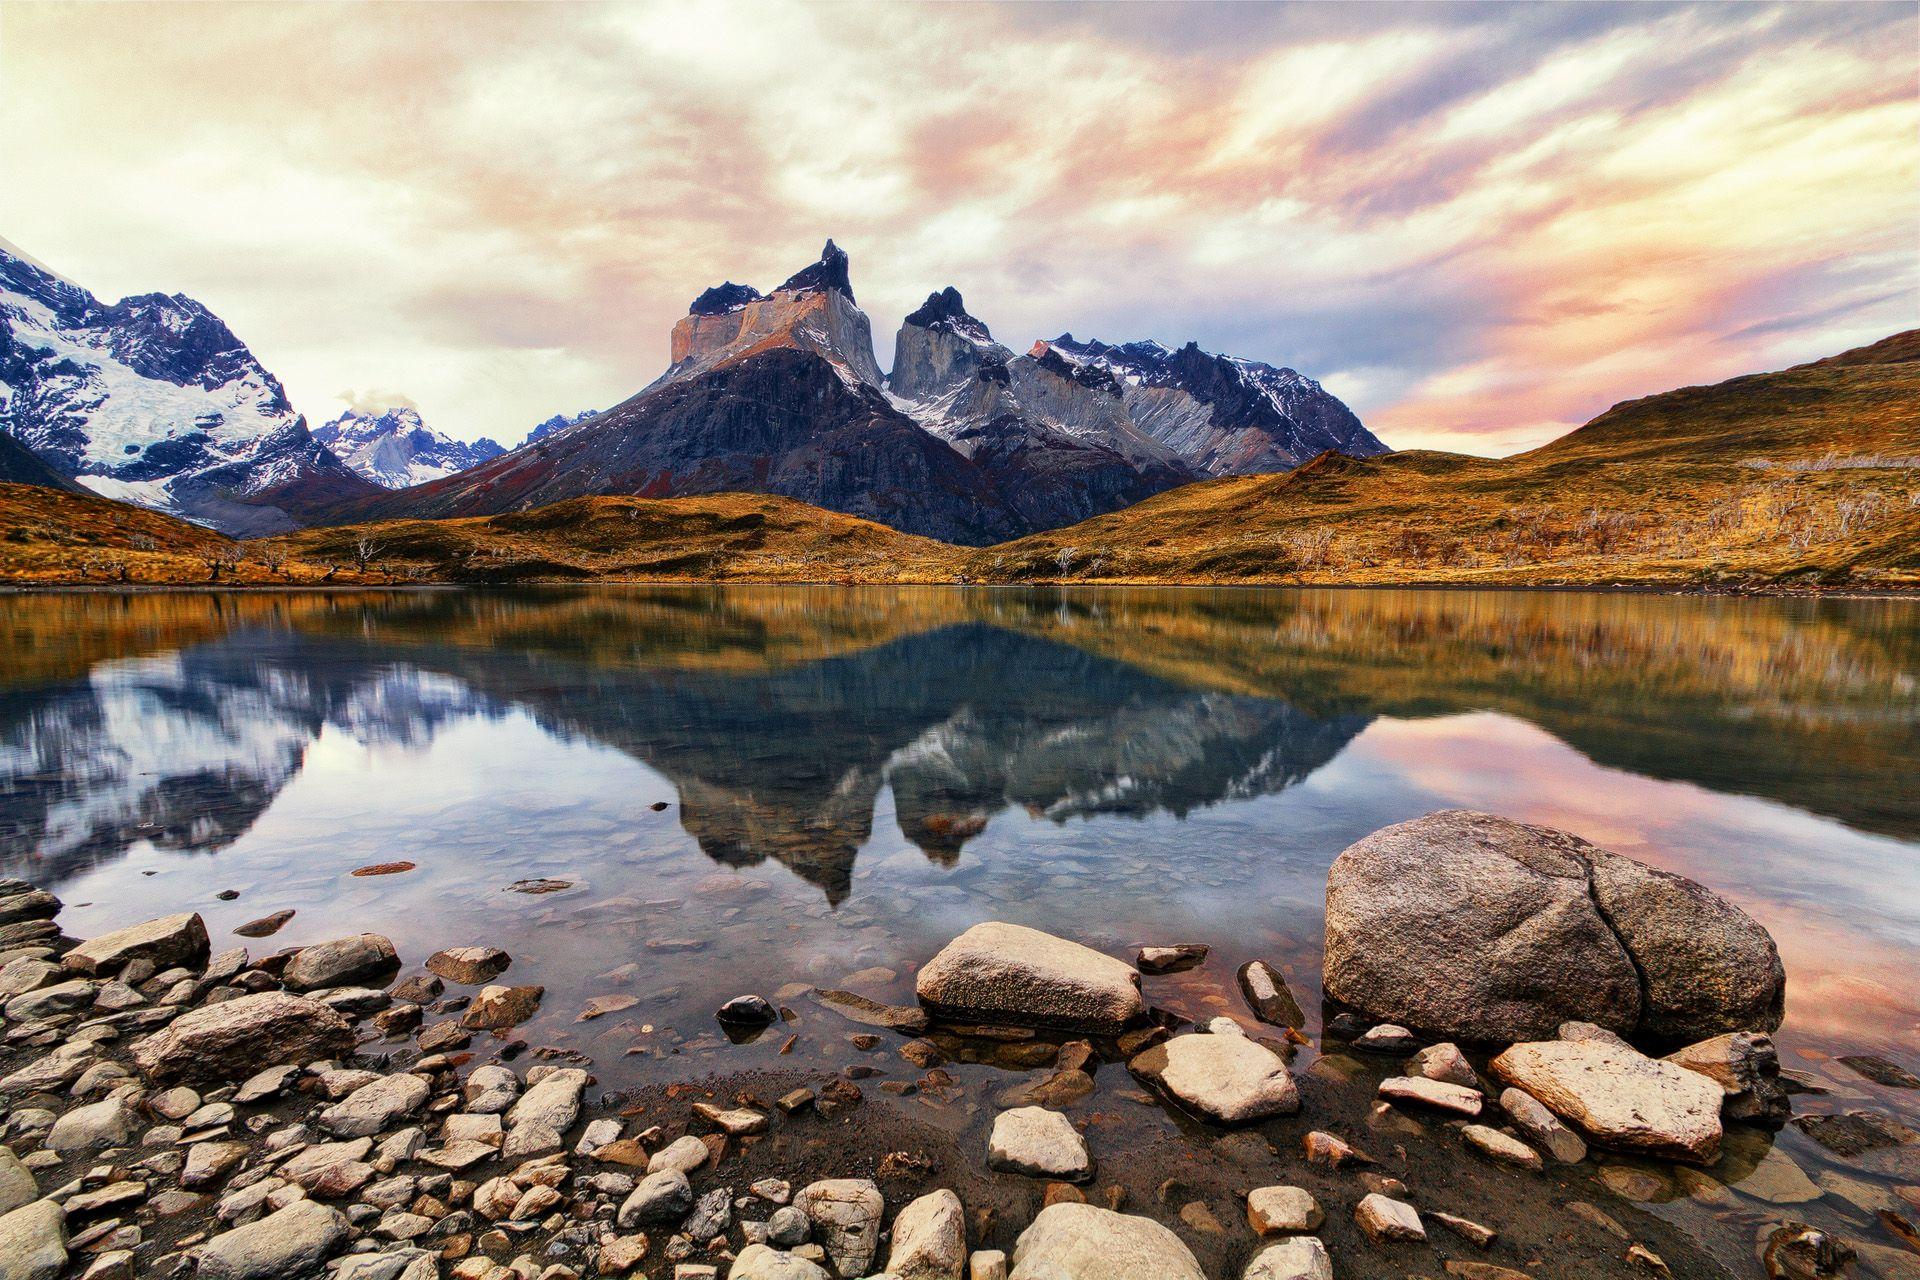 reflection, Lake Pehoé, sunset, mountains, colorful sky, cuernos del paine, Cordillera Paine,Torres del Paine National Park, Parque Nacional, Patagonia, Chile